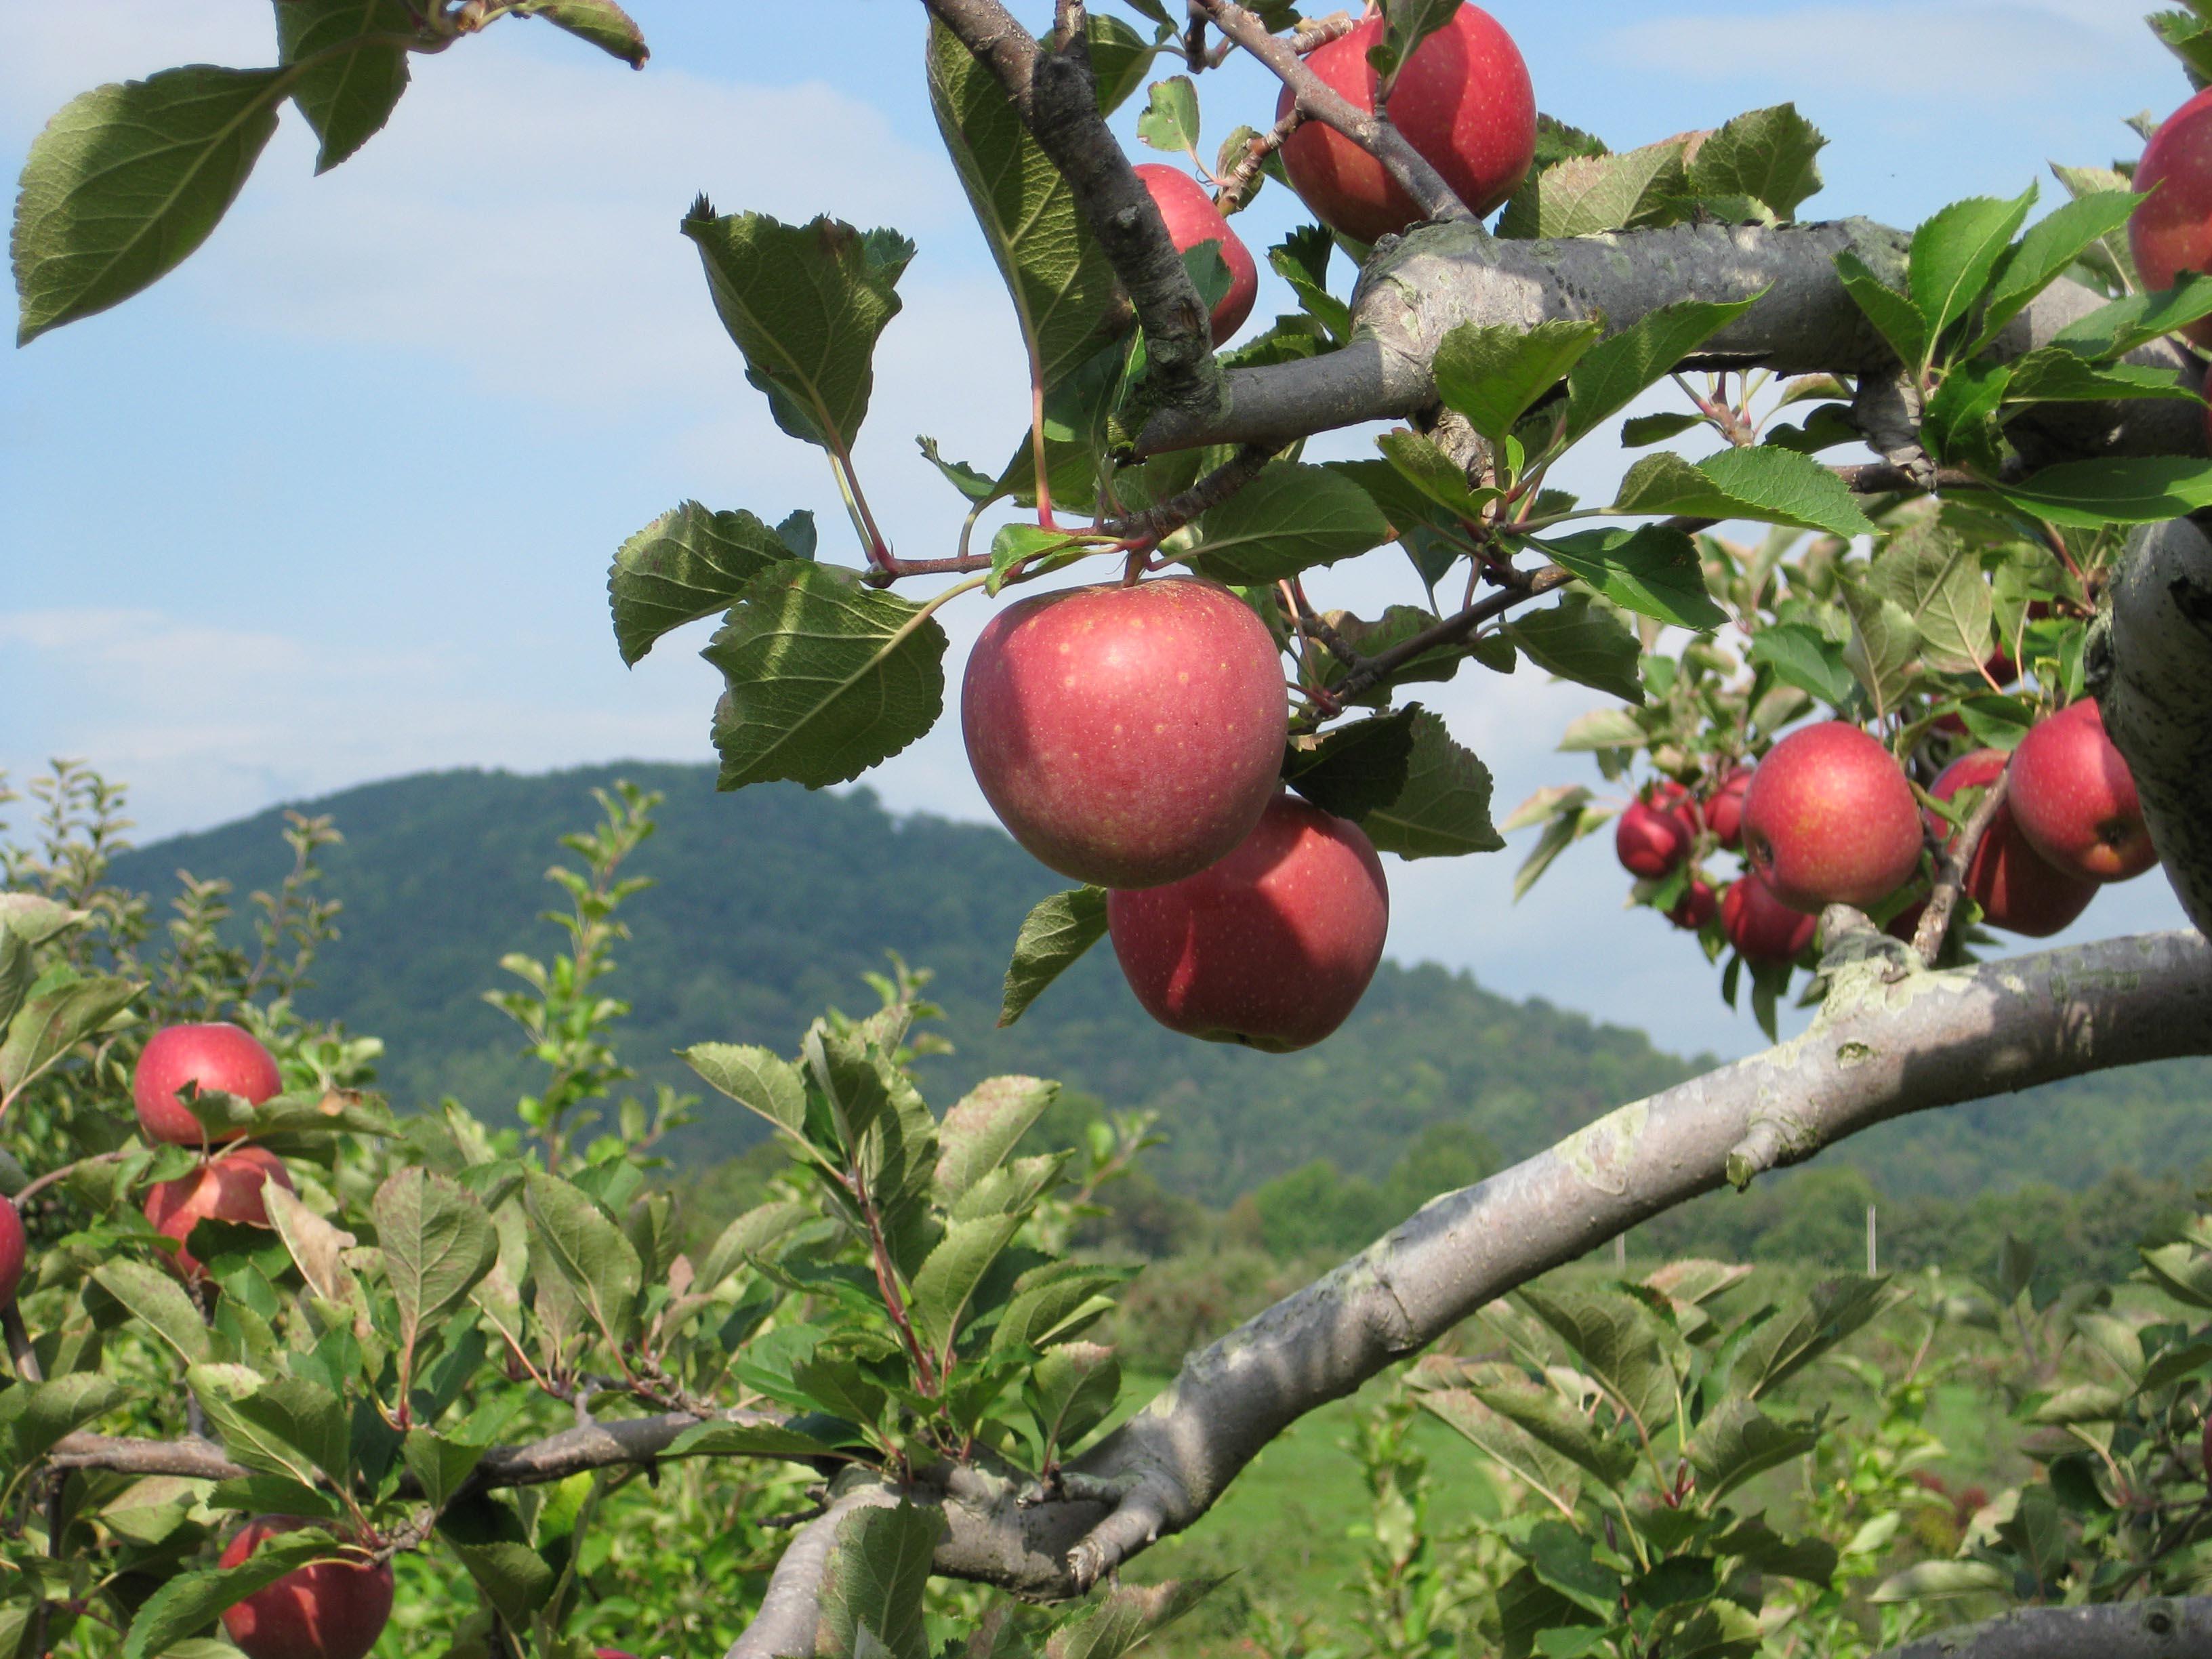 Graves Mountain Apples